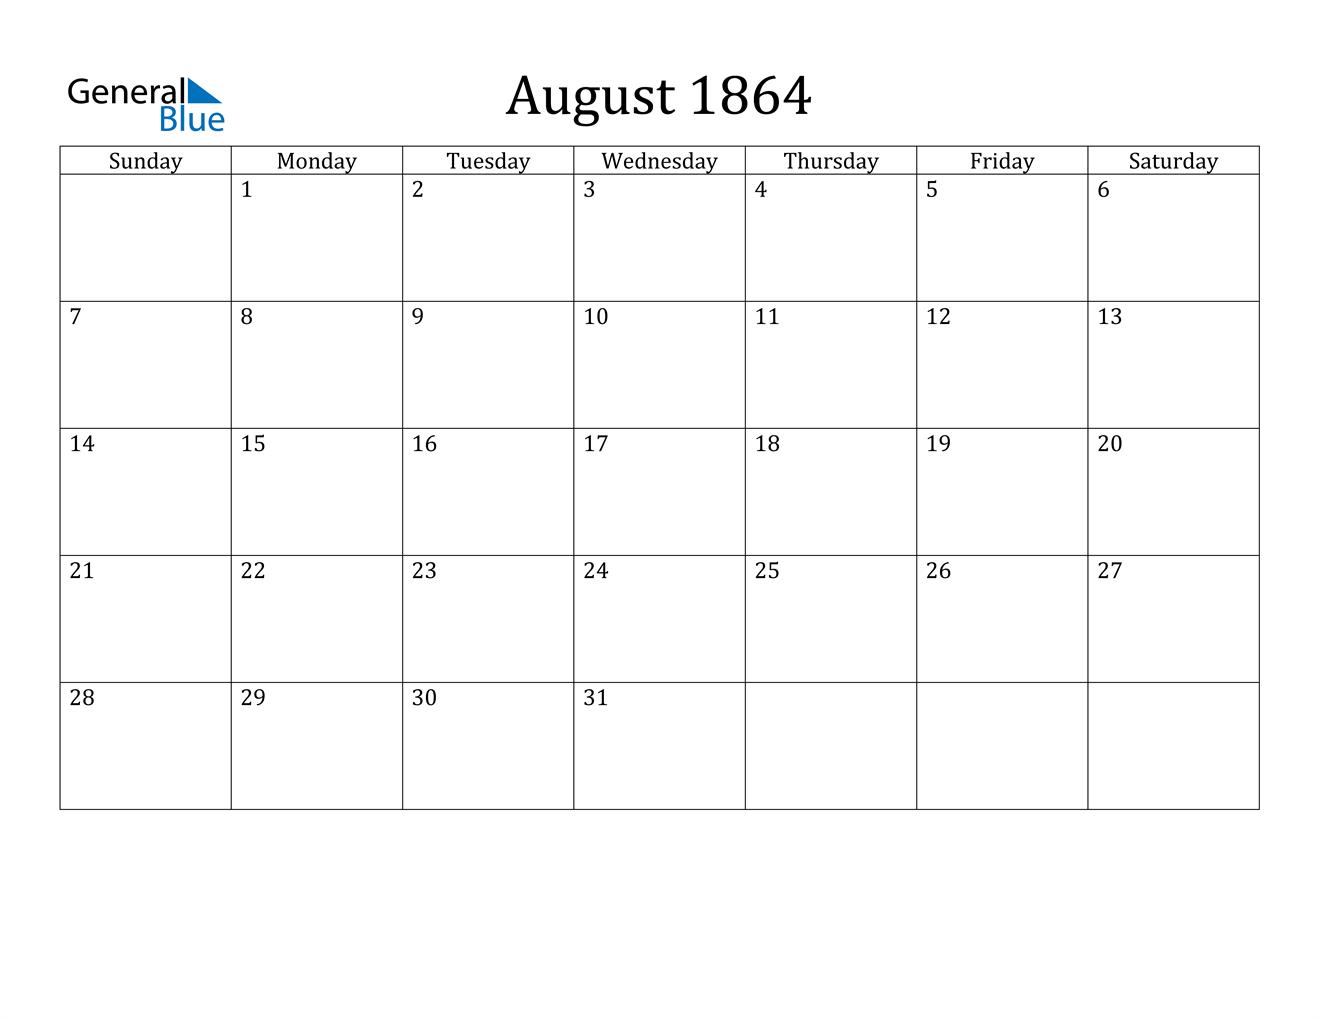 Image of August 1864 Calendar